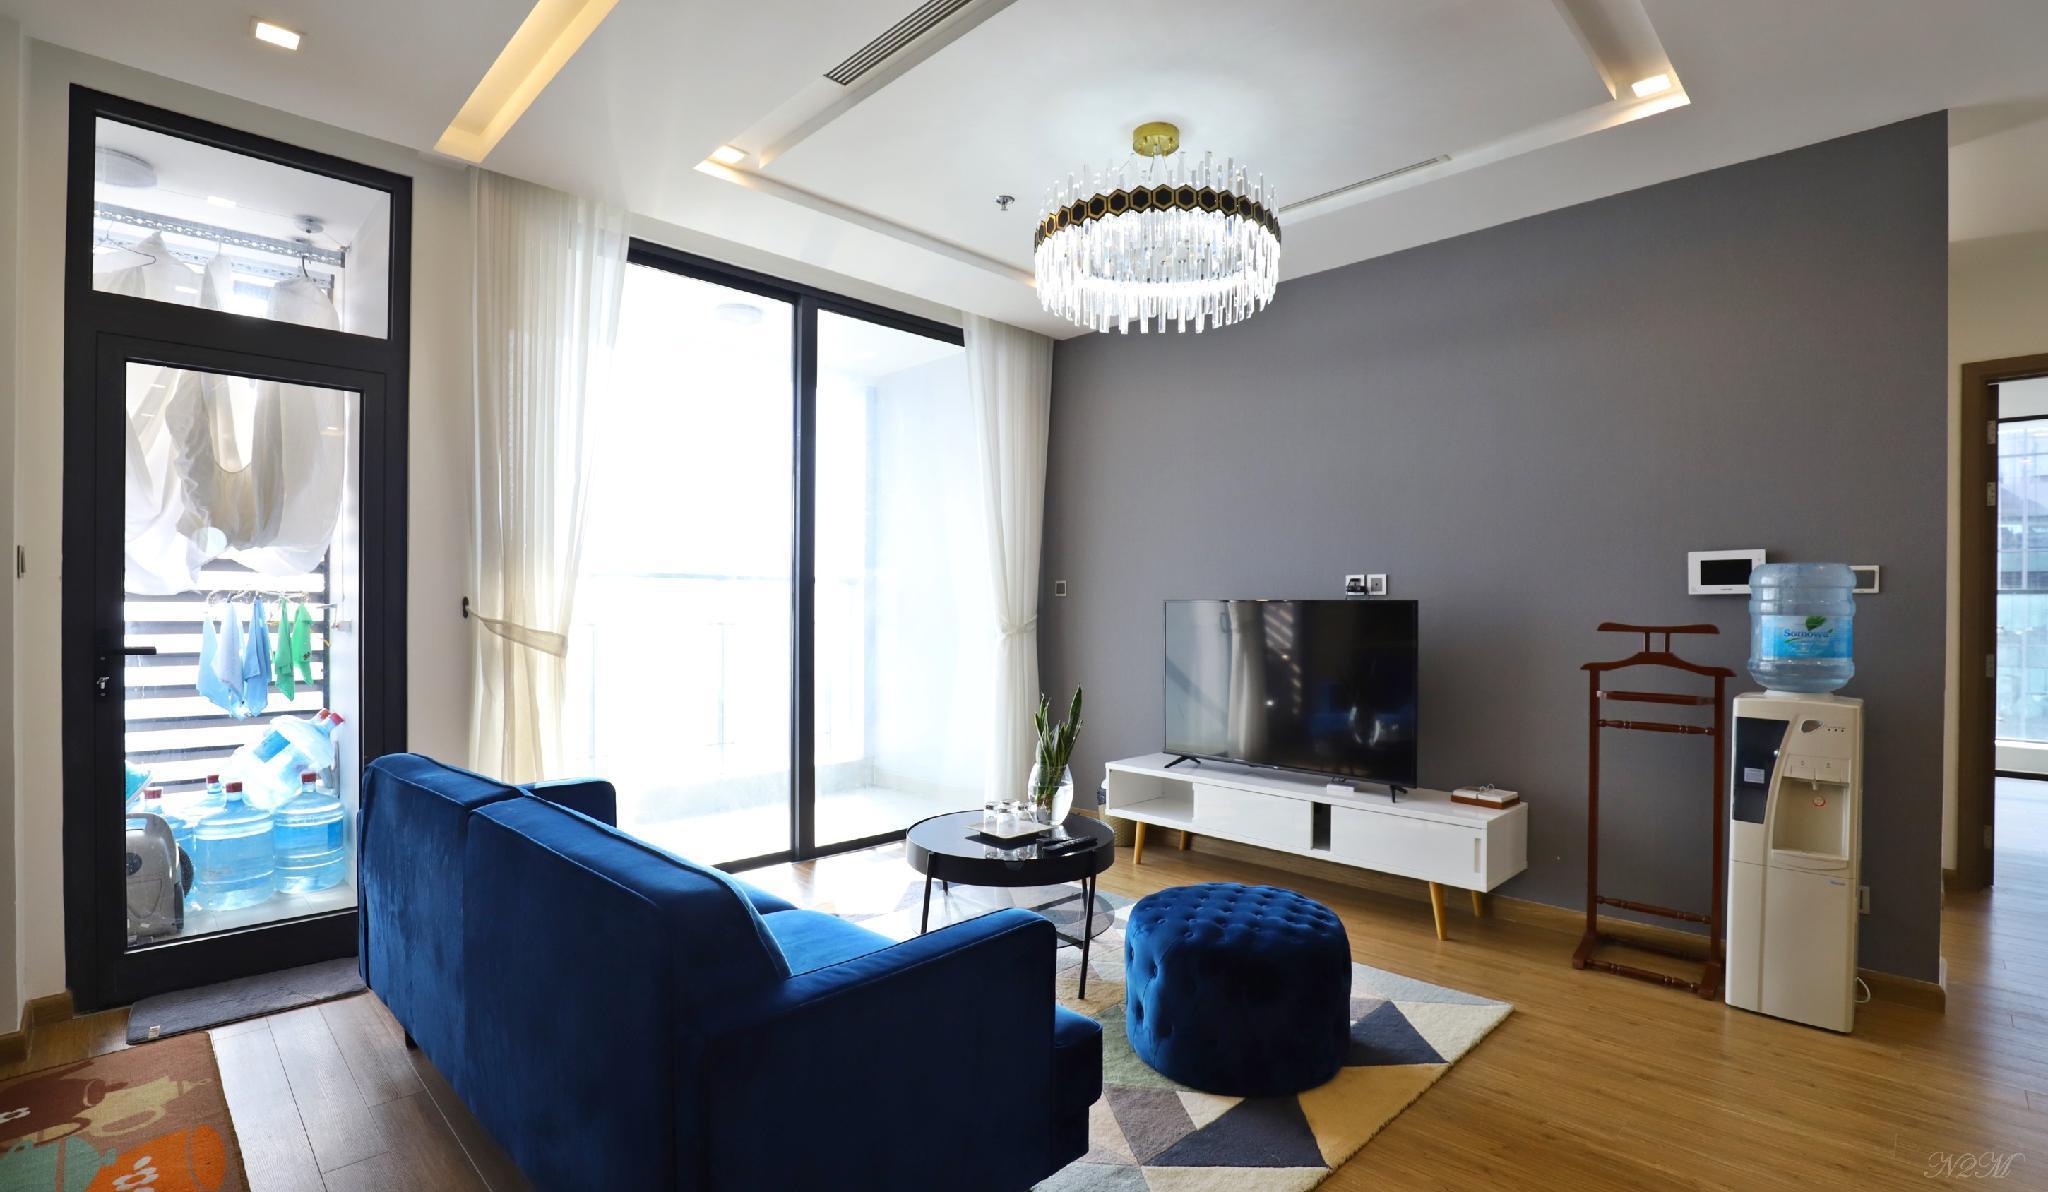 QMP 3 Luxurious Bedroom Near LOTTE